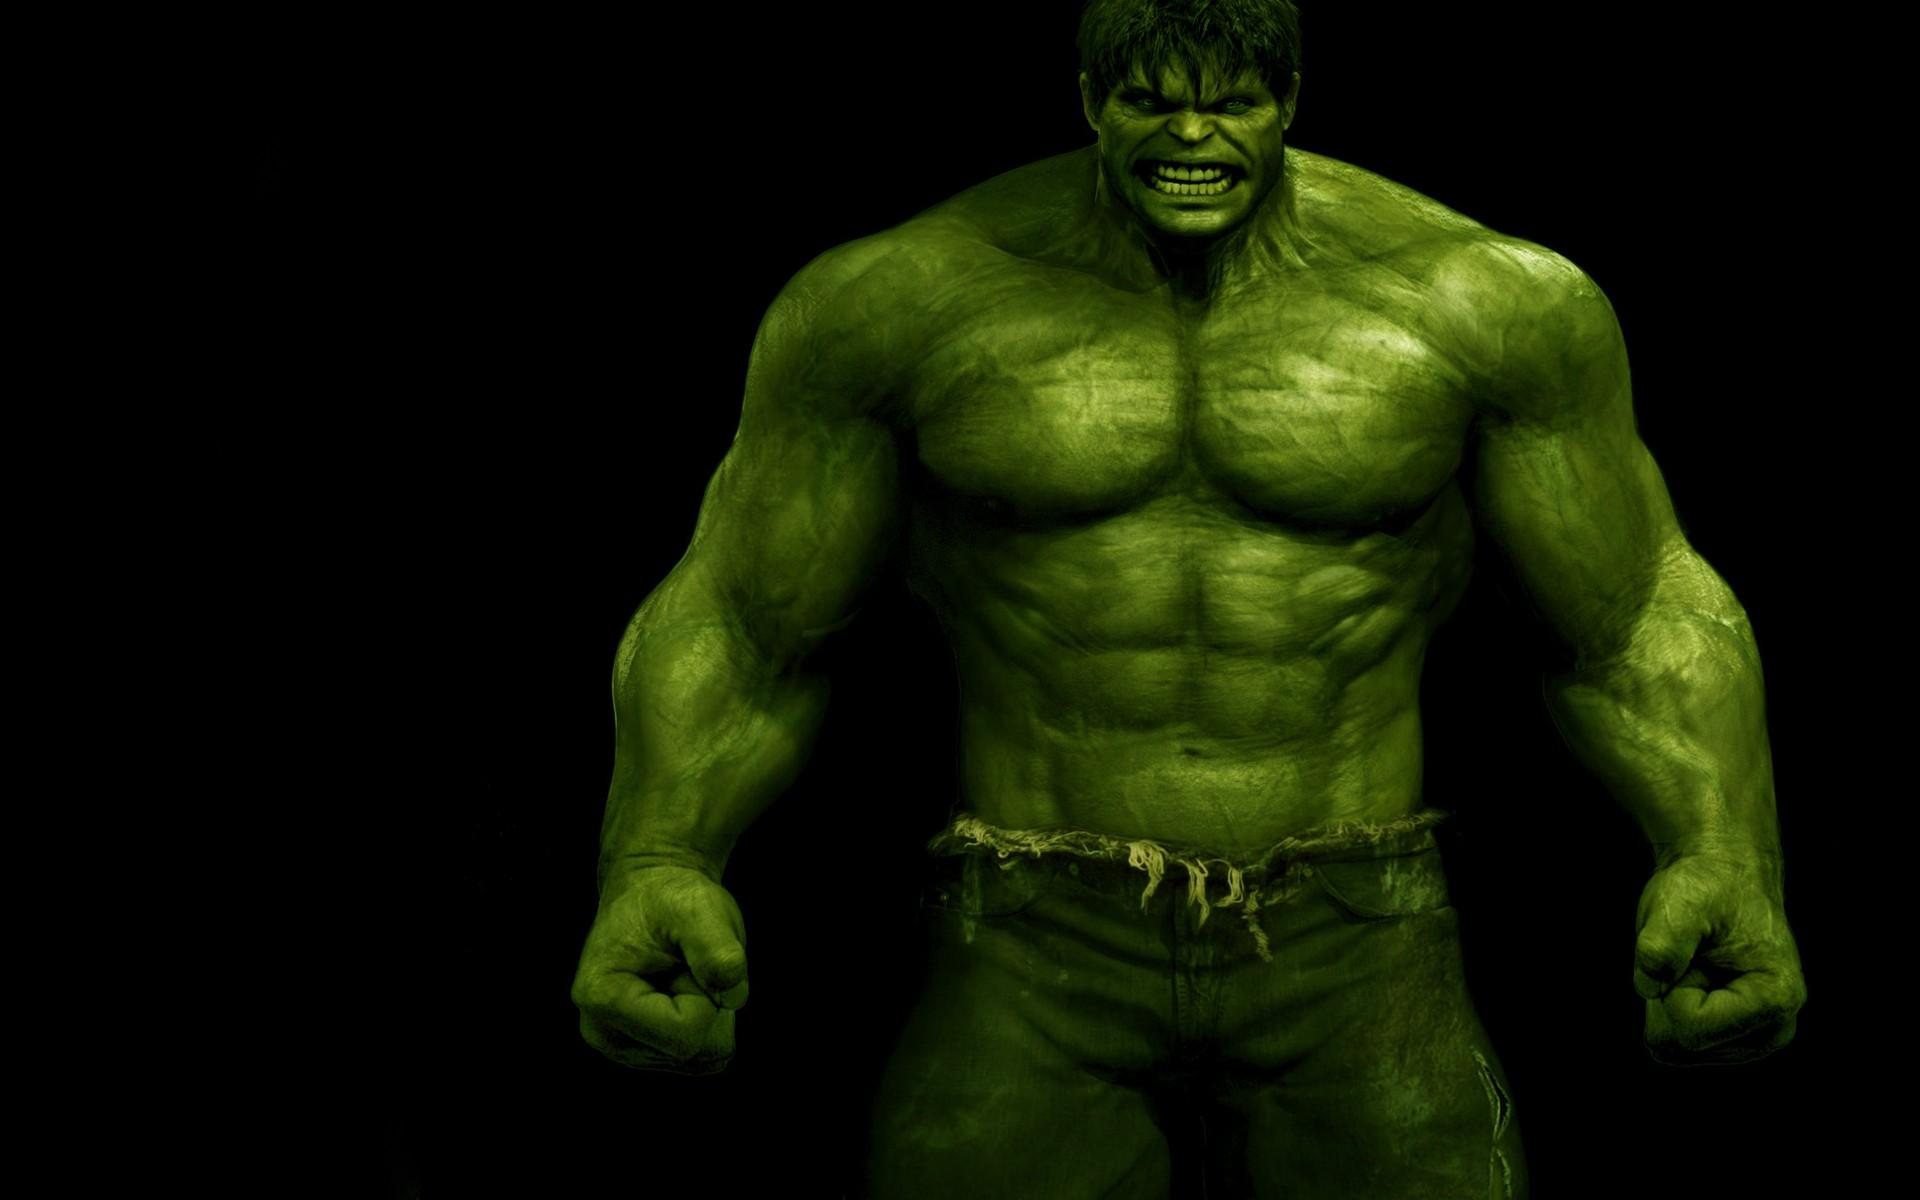 Incredible Hulk HD Wallpaper 1920x1200